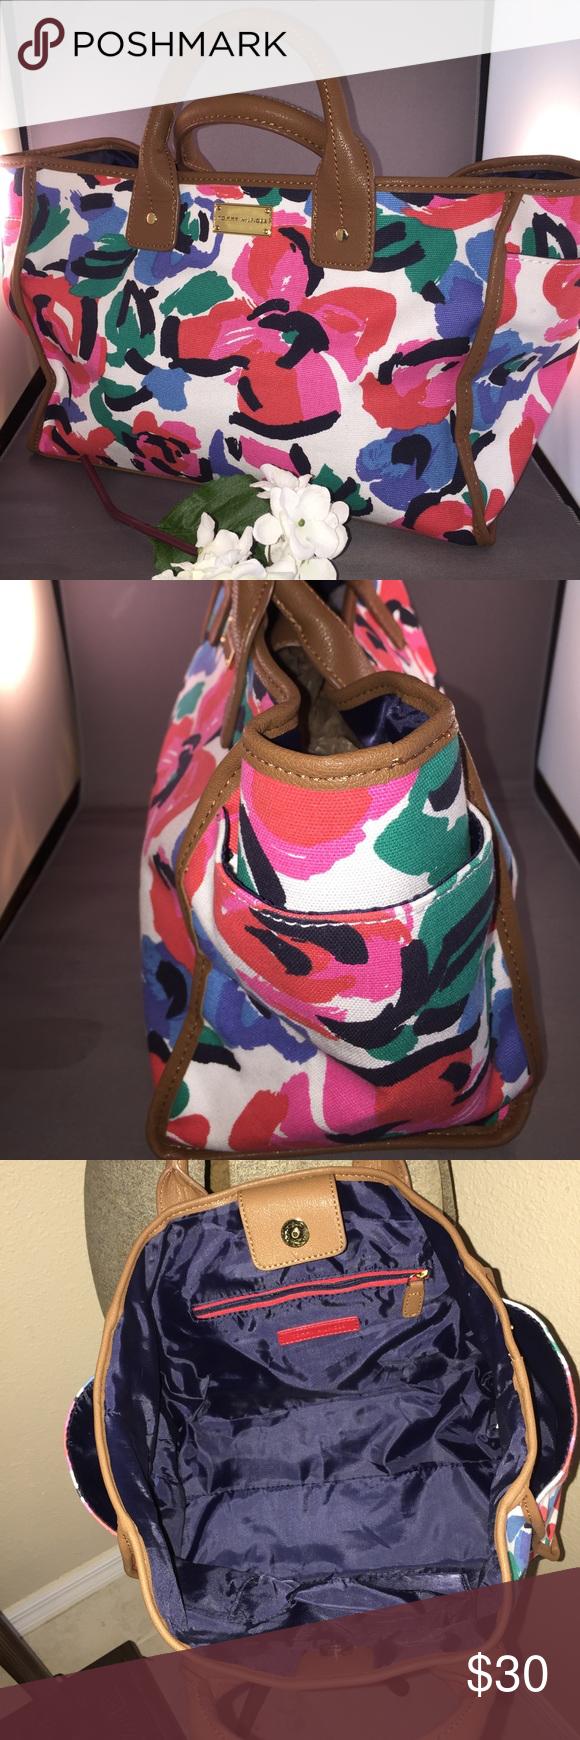 Tommy Hilfiger Colorful Spring Tote/Handbag Beautiful Like New colorful Tommy Hilfiger handbag/Tote. Tommy Hilfiger Bags Totes